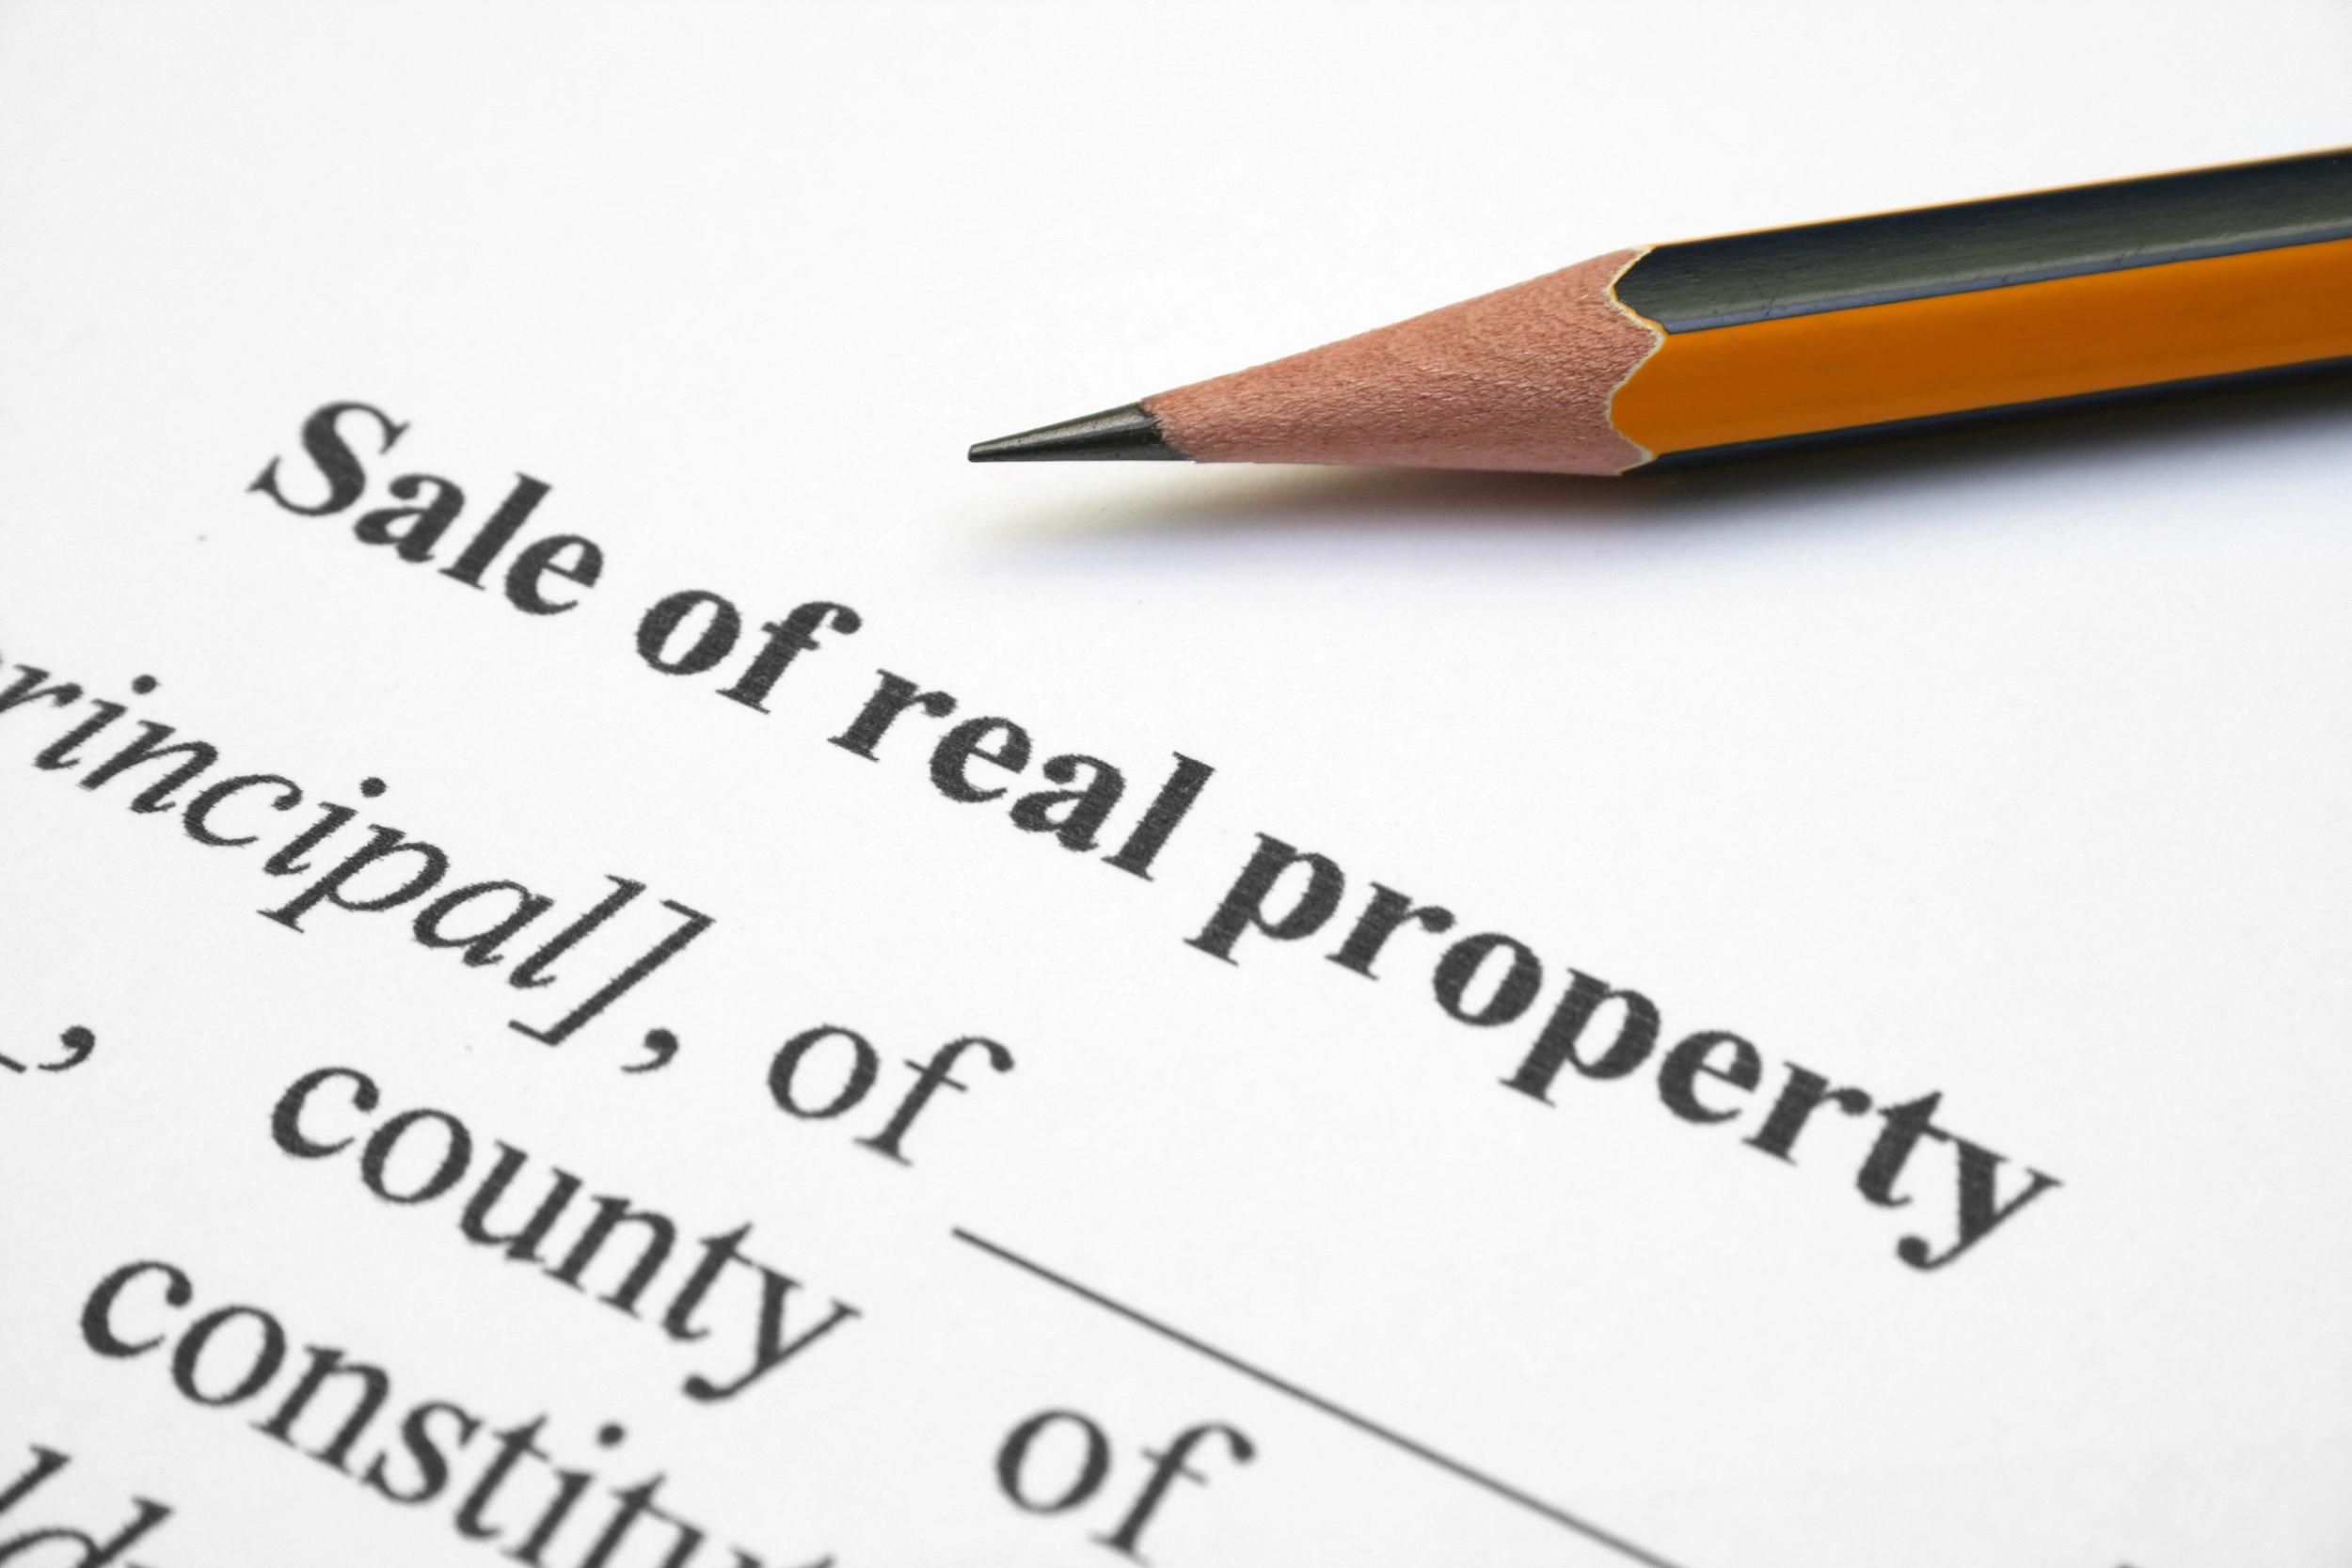 sale-of-real-property_GJlaEPvd.jpg